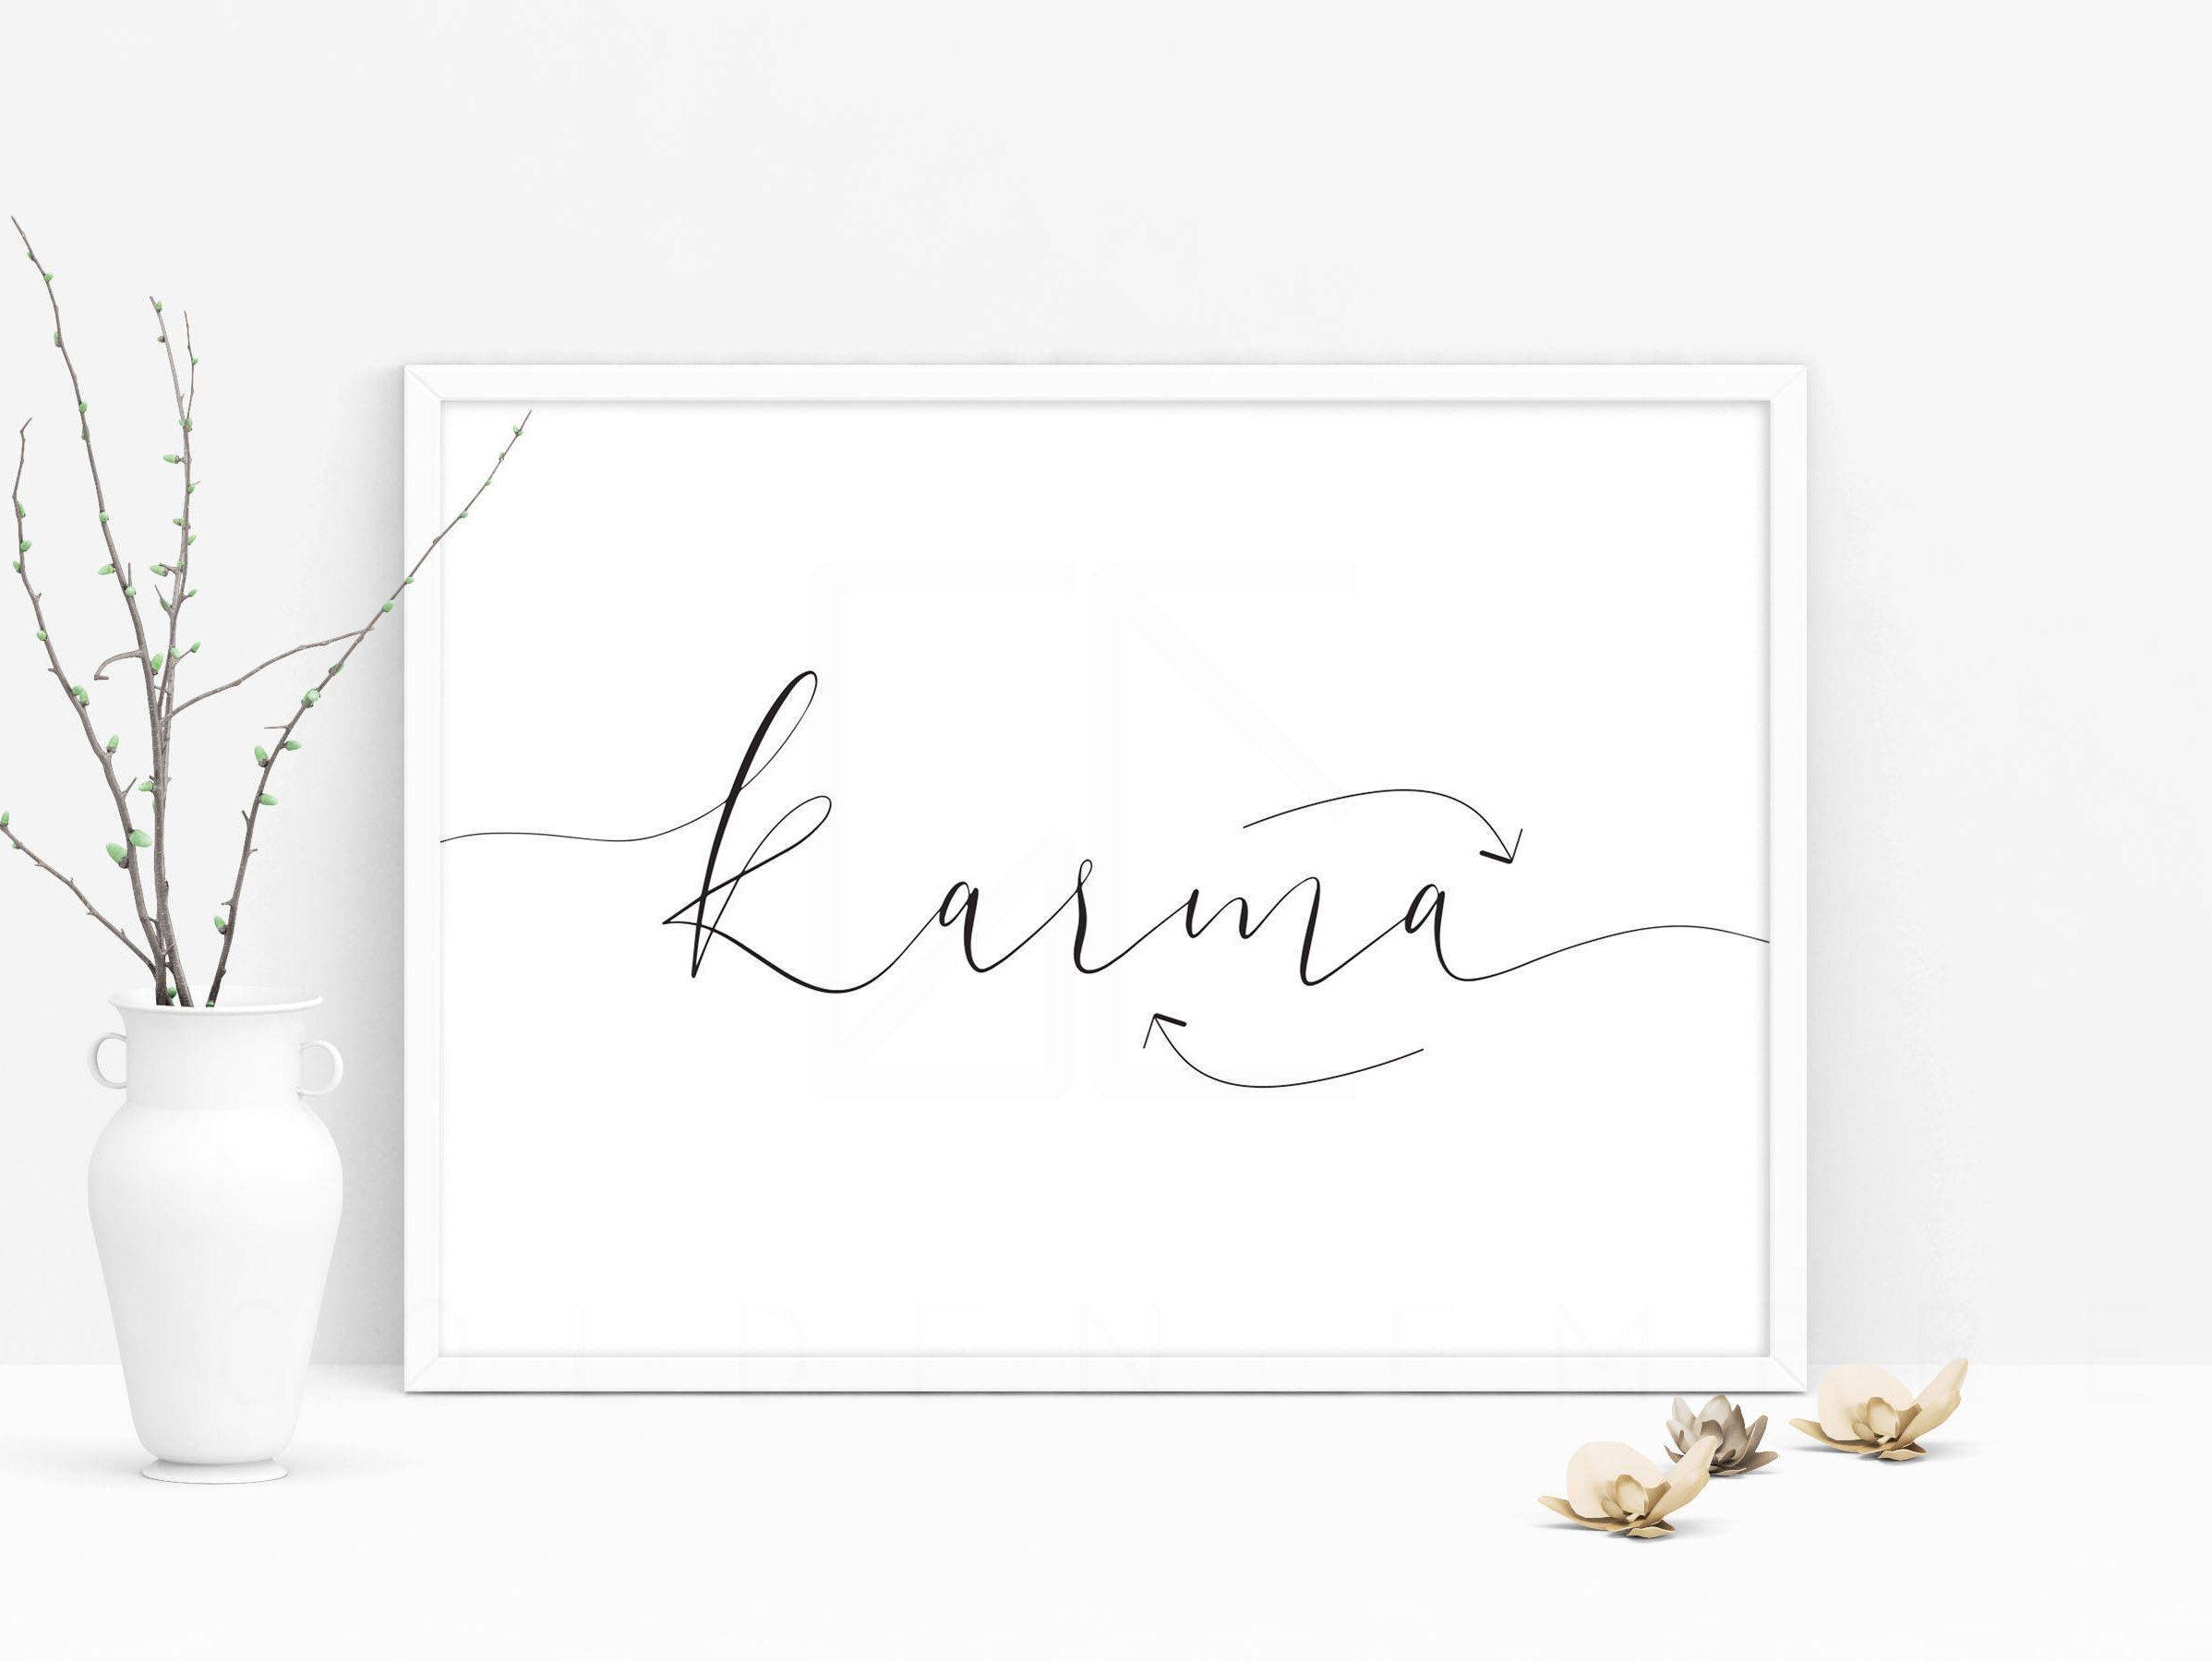 karma QUOTE, karma print, PRINTABLE quote in 2020 Karma